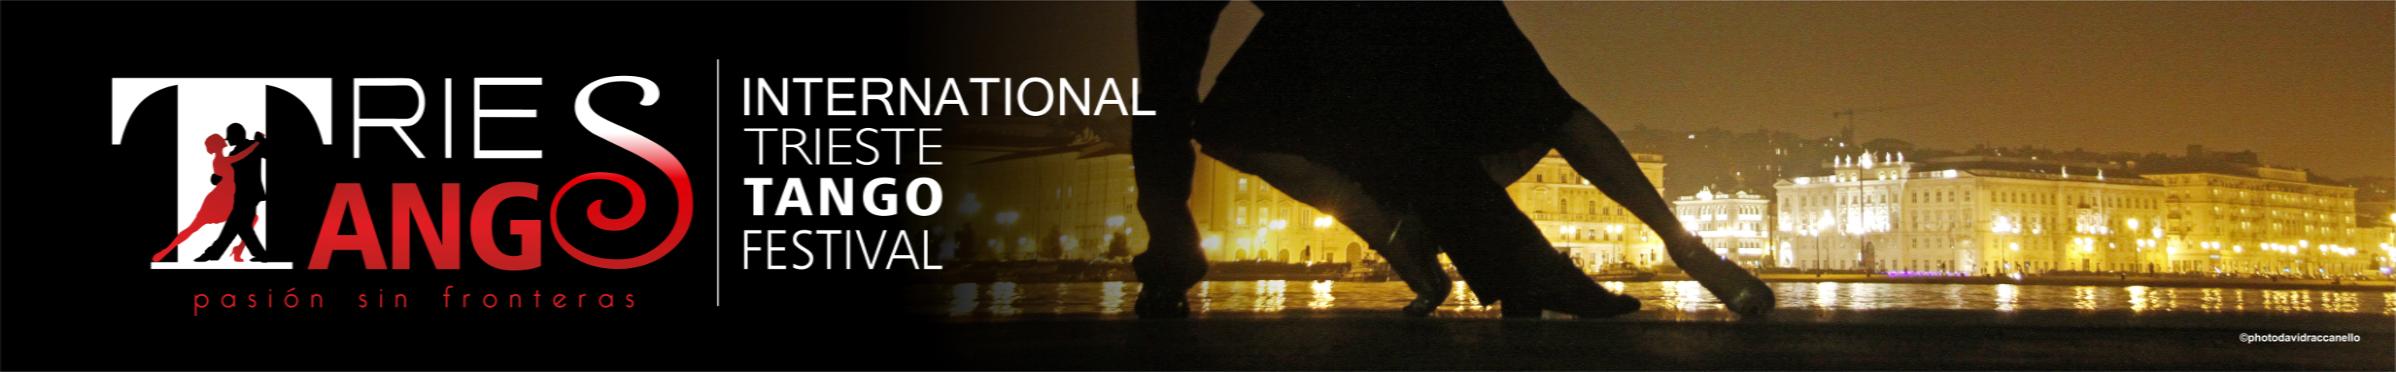 International Trieste Tango Festival